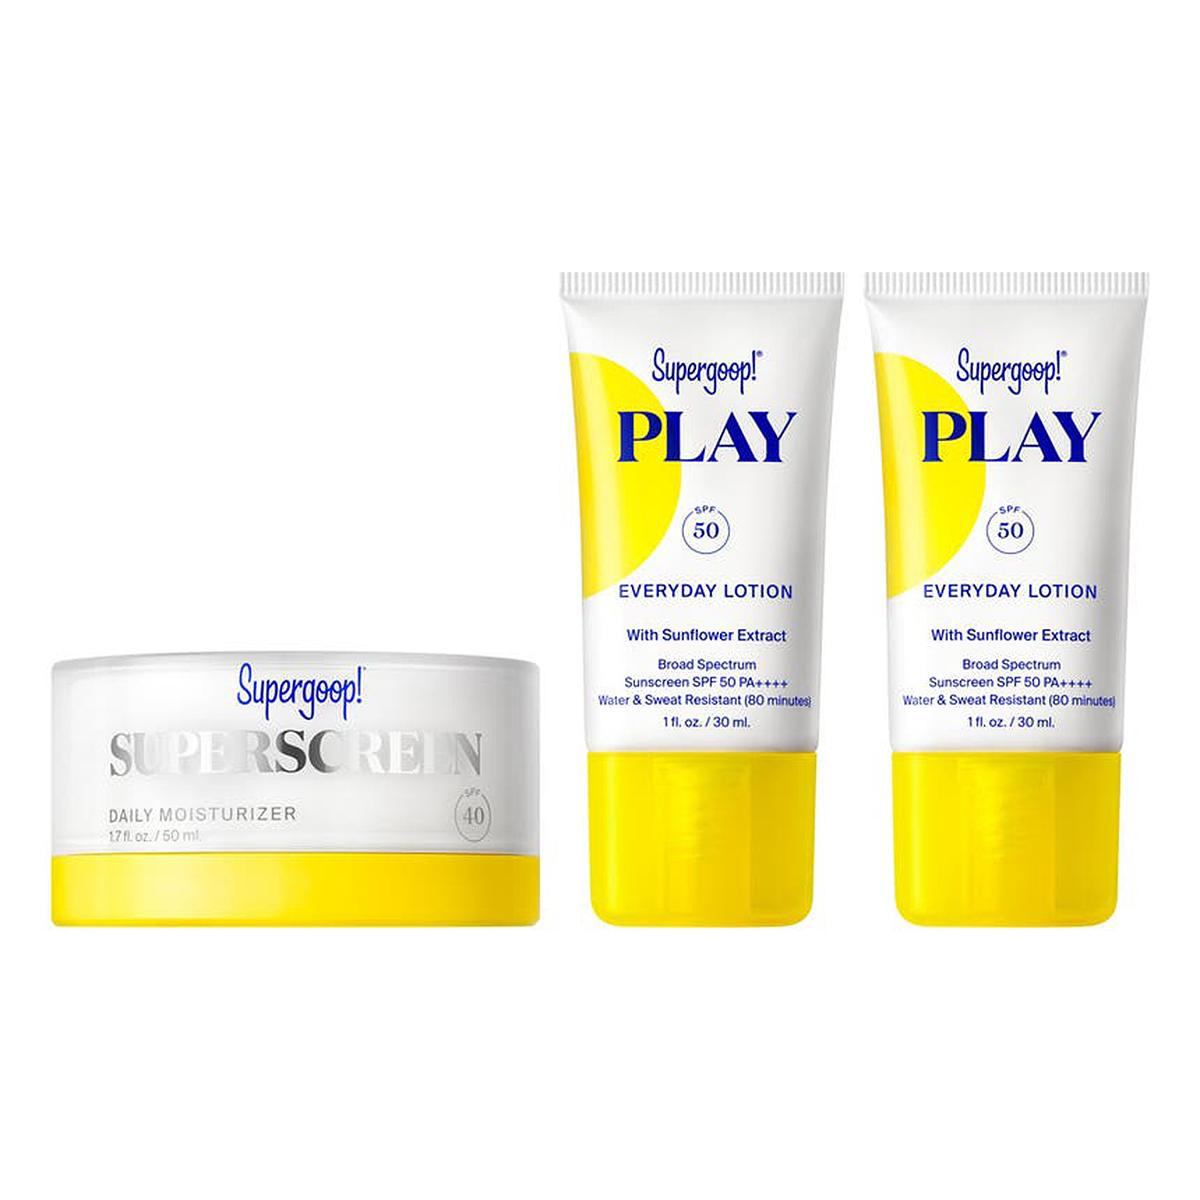 nordstrom-anniversary-sale-skincare